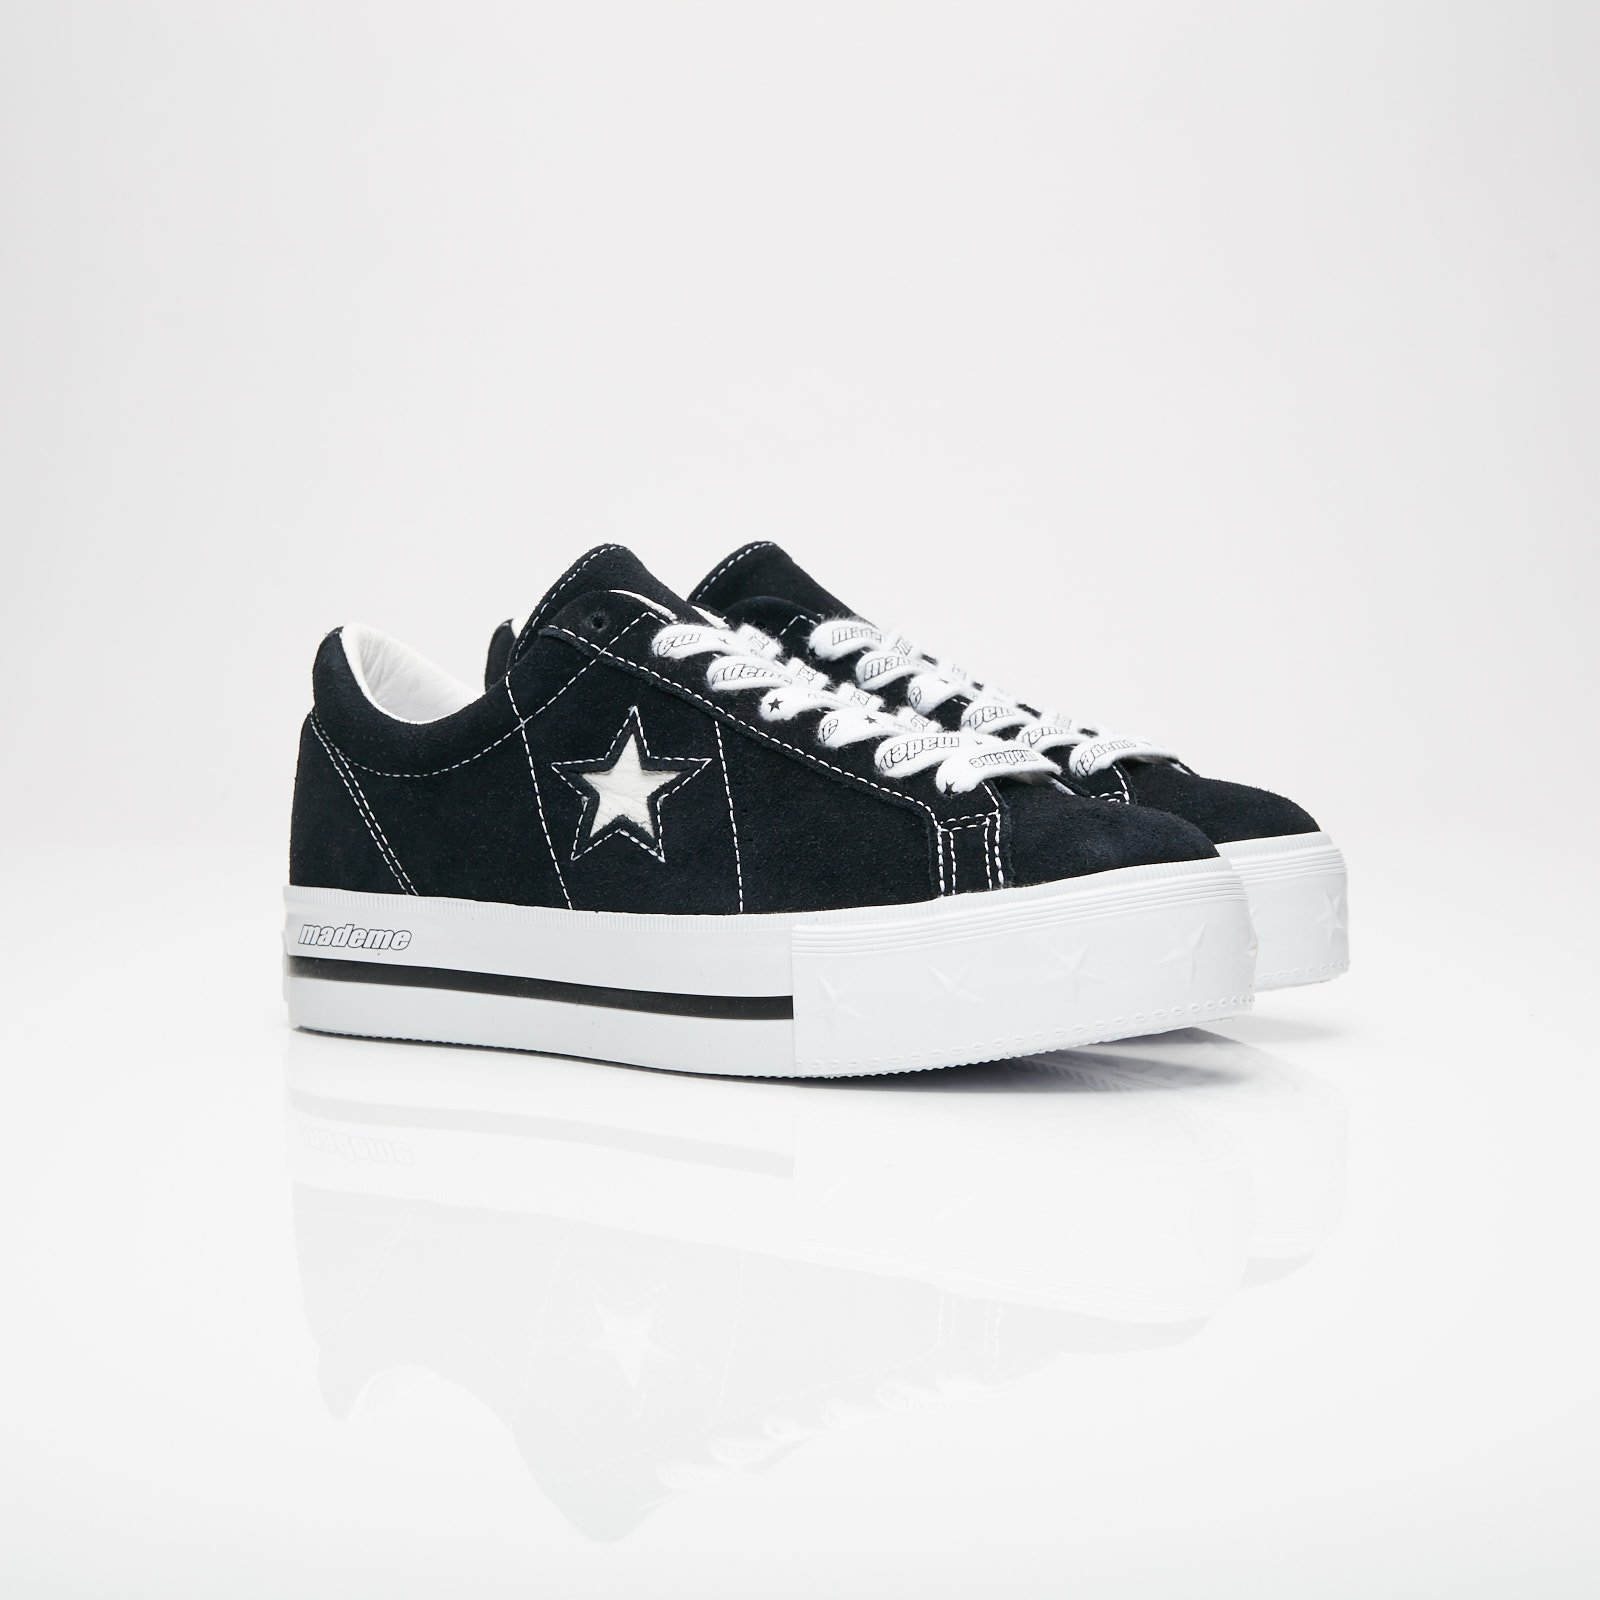 Converse One Star Platform x MadeMe 562959c